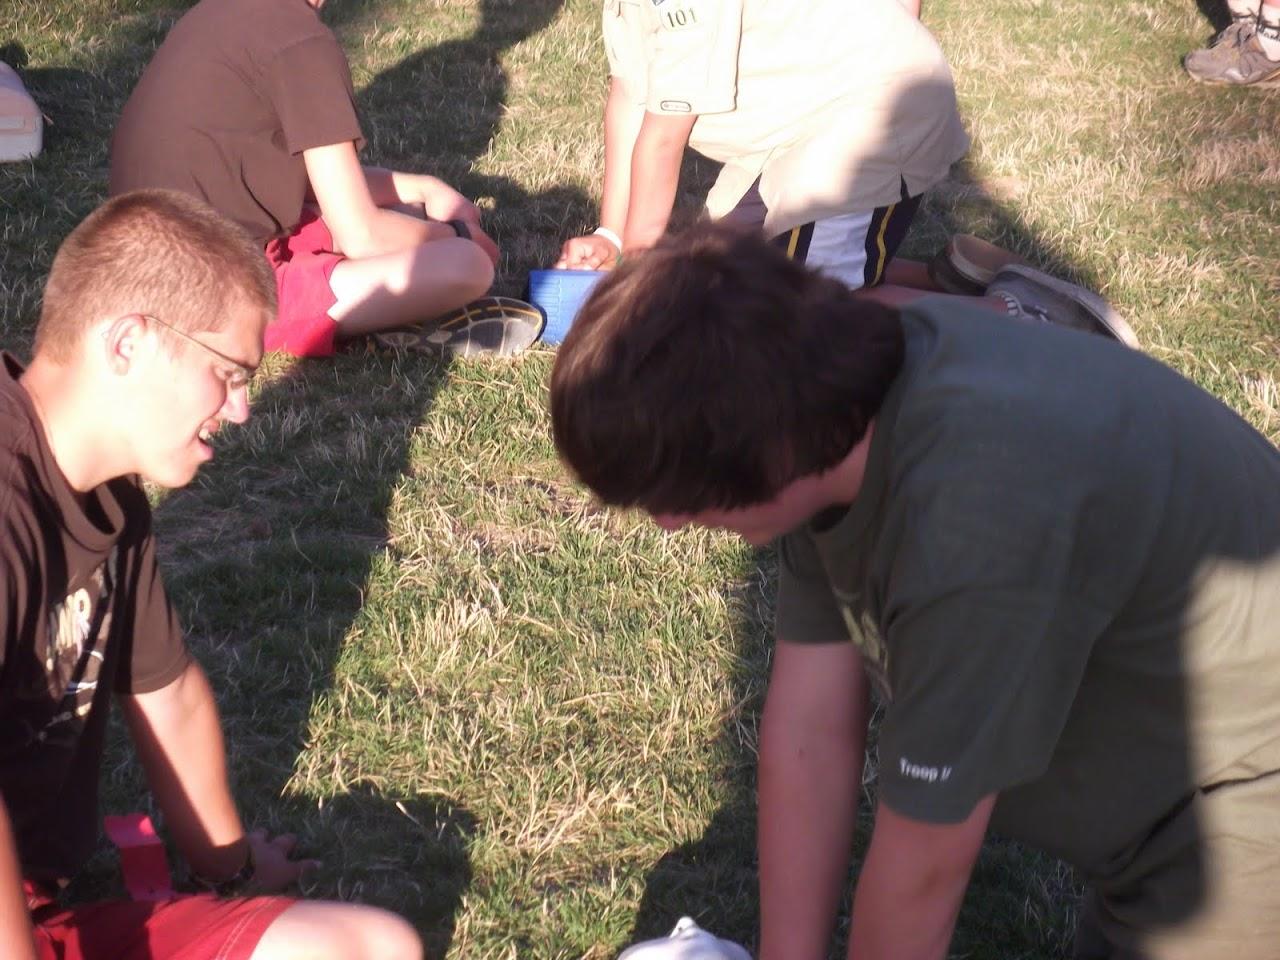 Dallis doing CPR